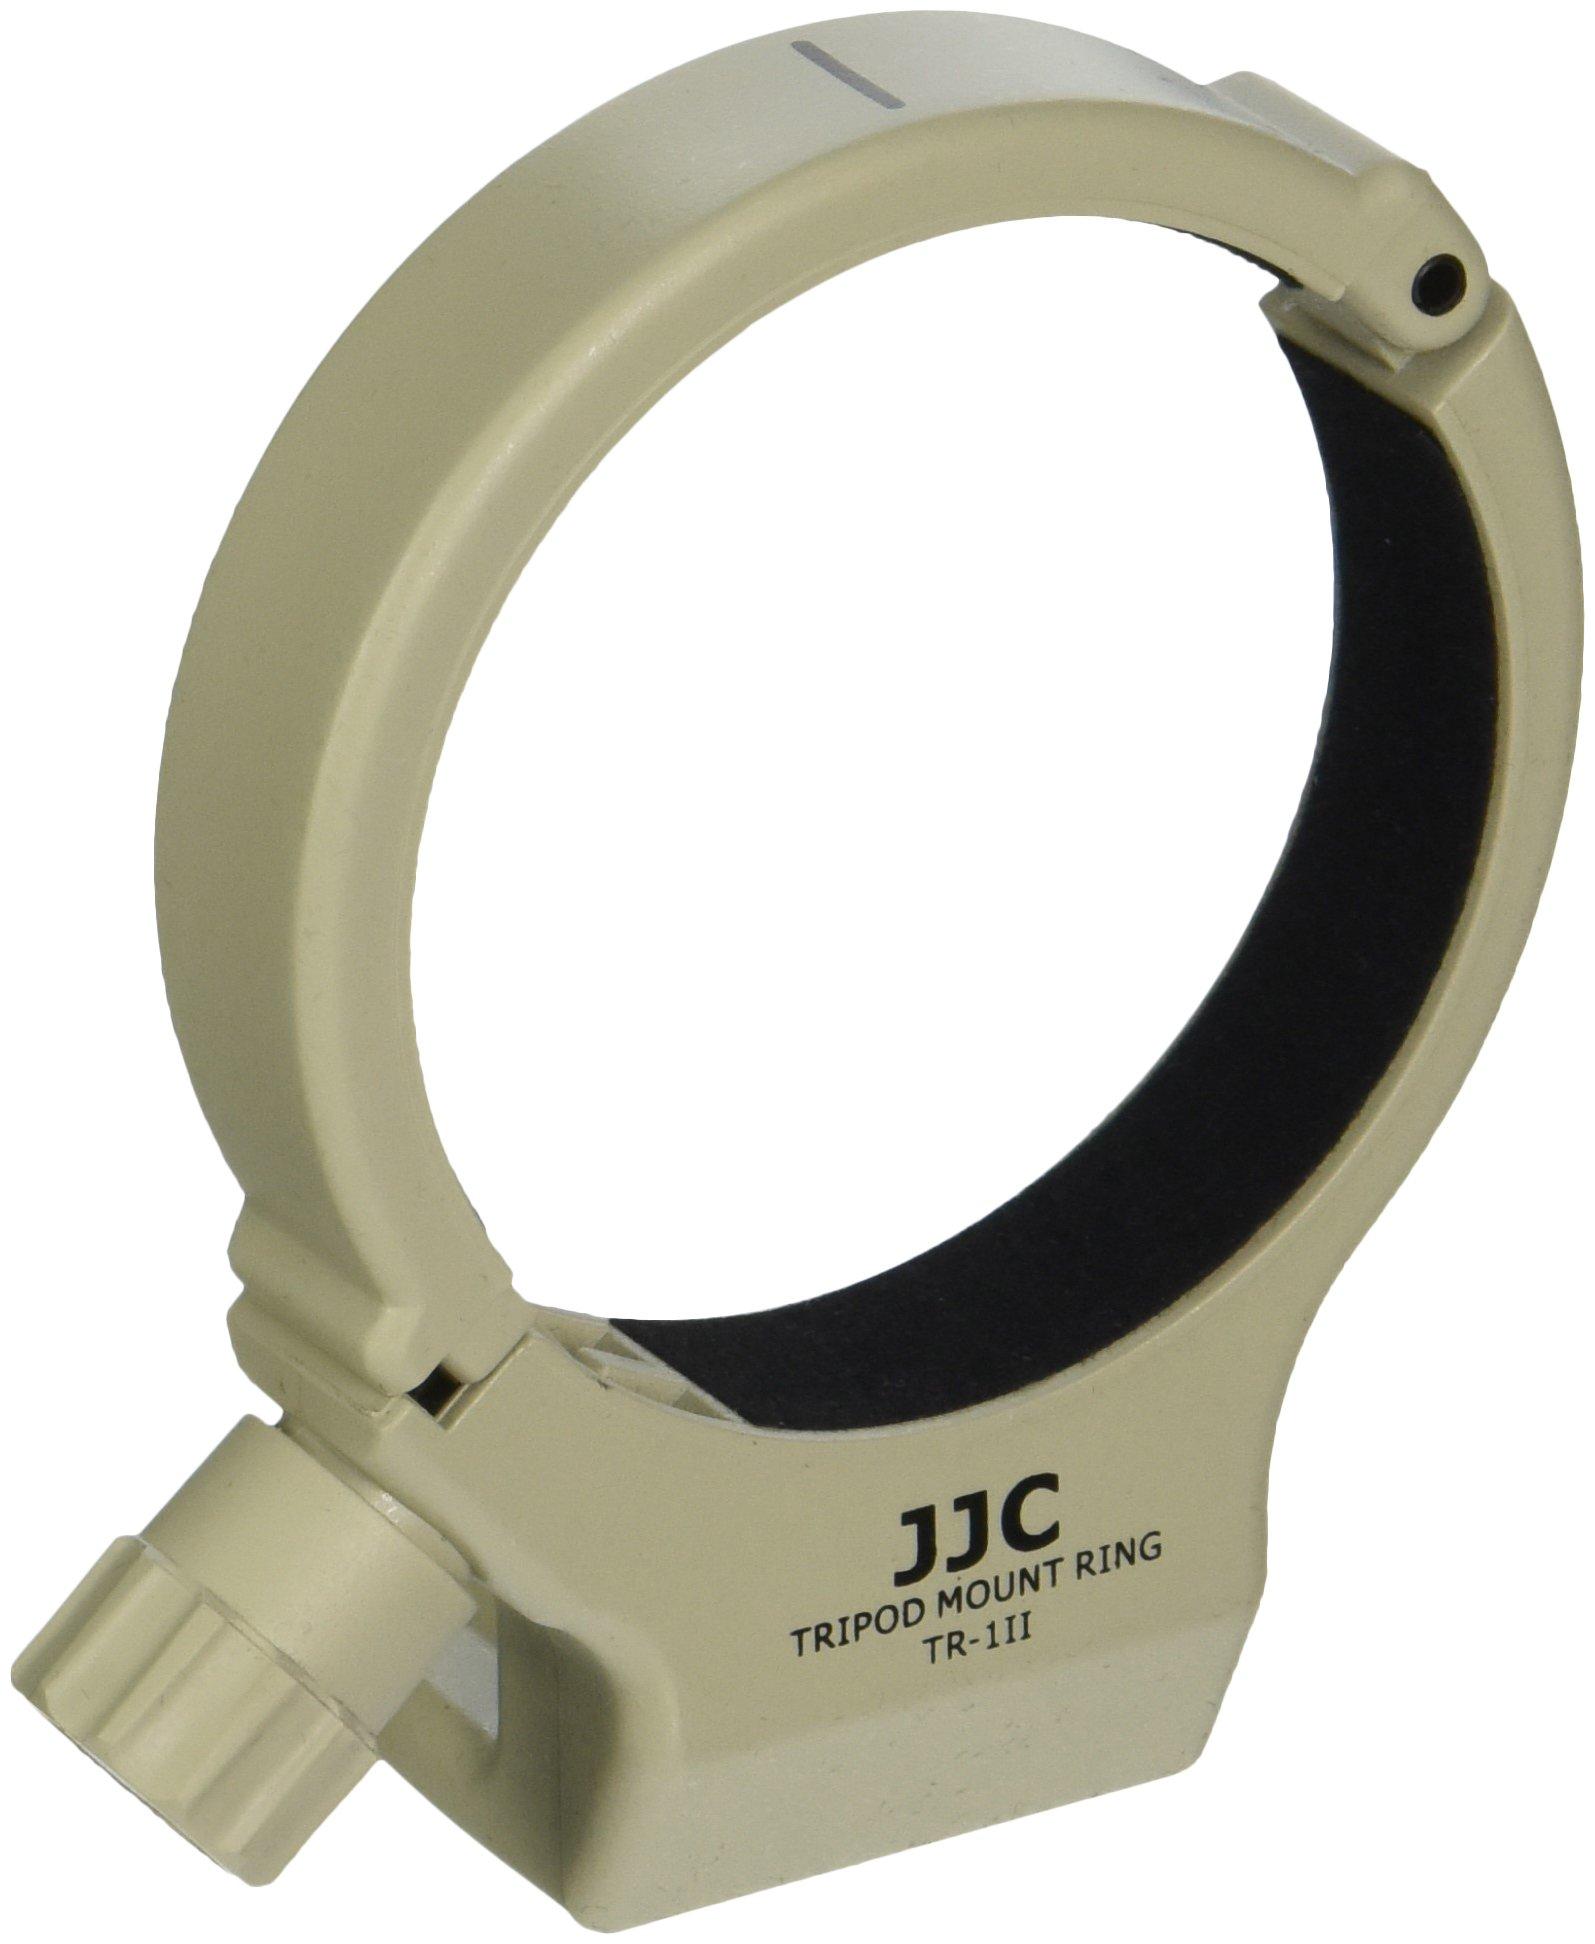 JJC TR Series Tripod Mount Ring, TR-1II, Canon EF 70-200mm F/4L, Canon EF 70/200mm f/4L IS by CowboyStudio